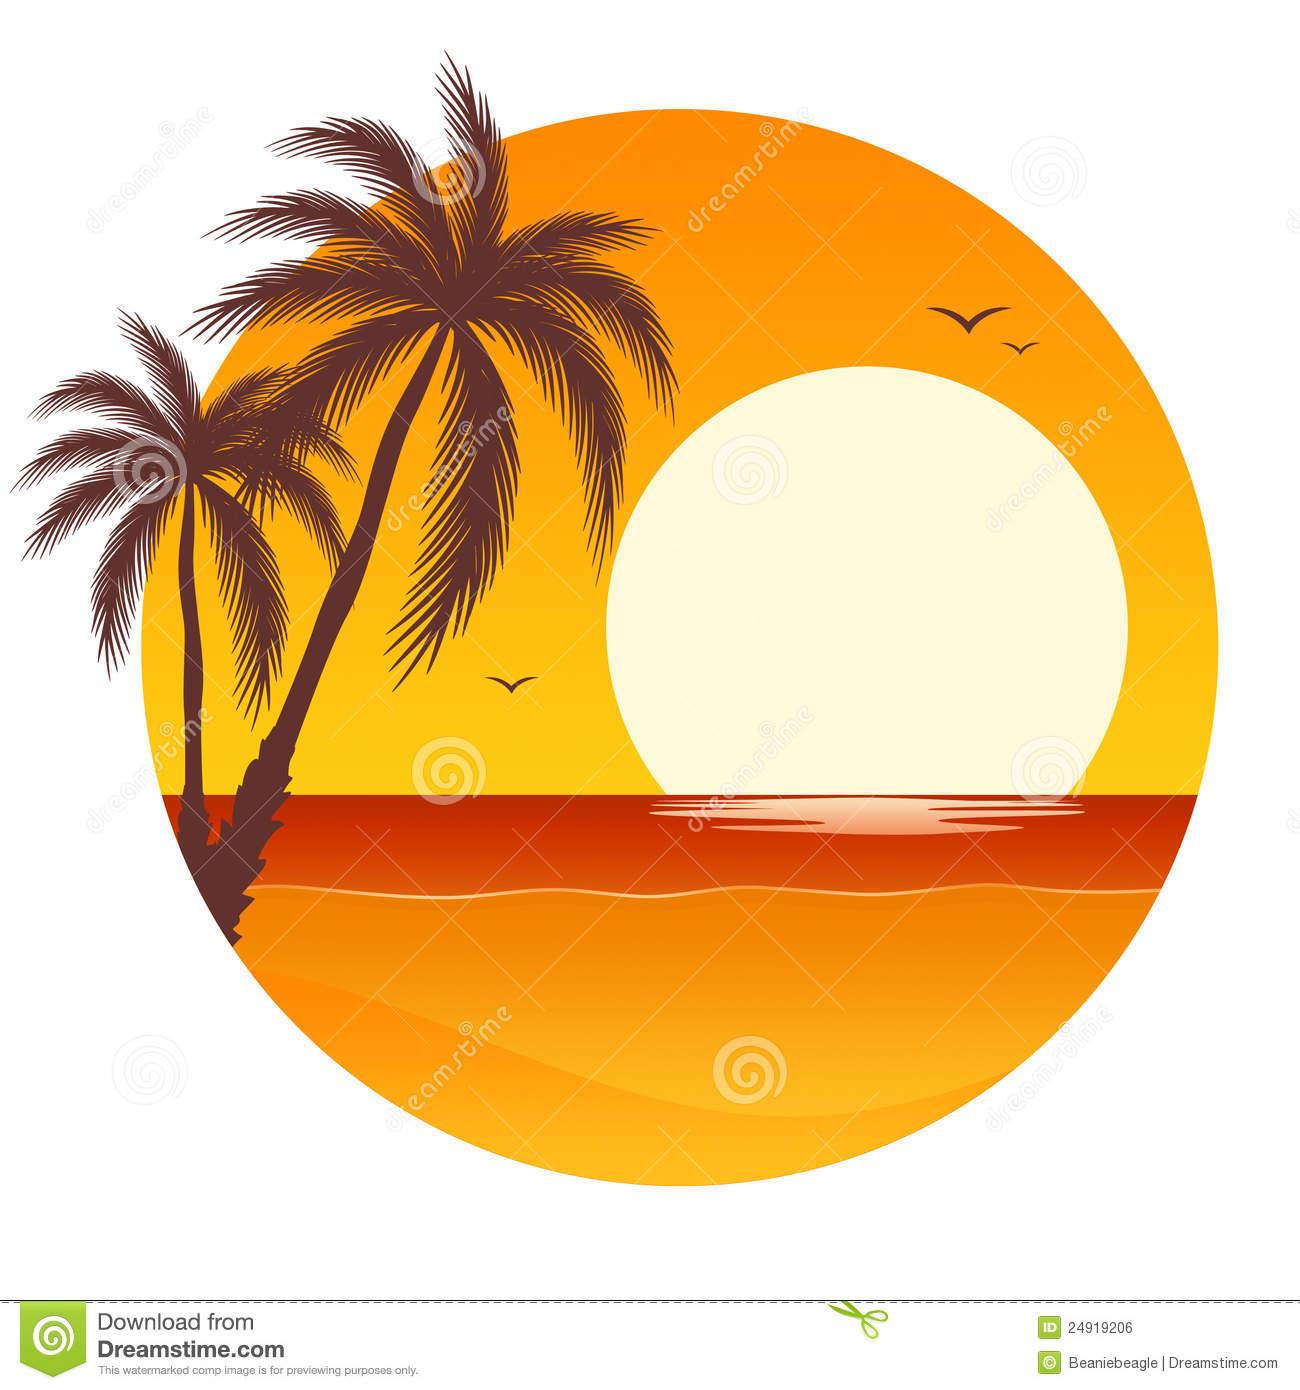 Ocean clipart ocean sunset Download and White White Black